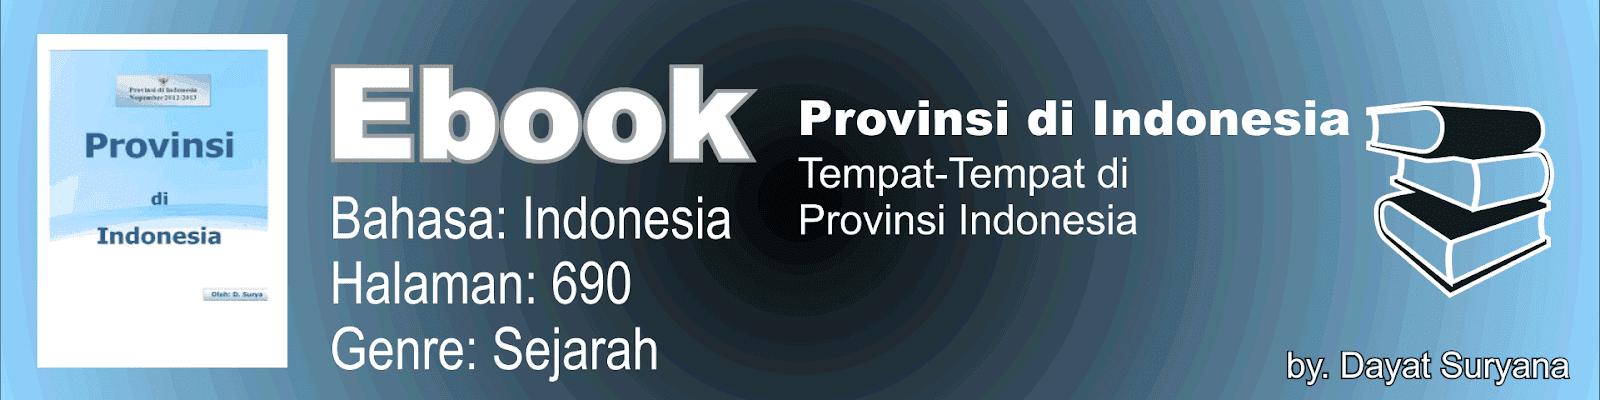 Buku Provinsi-Provinsi Di Indonesia